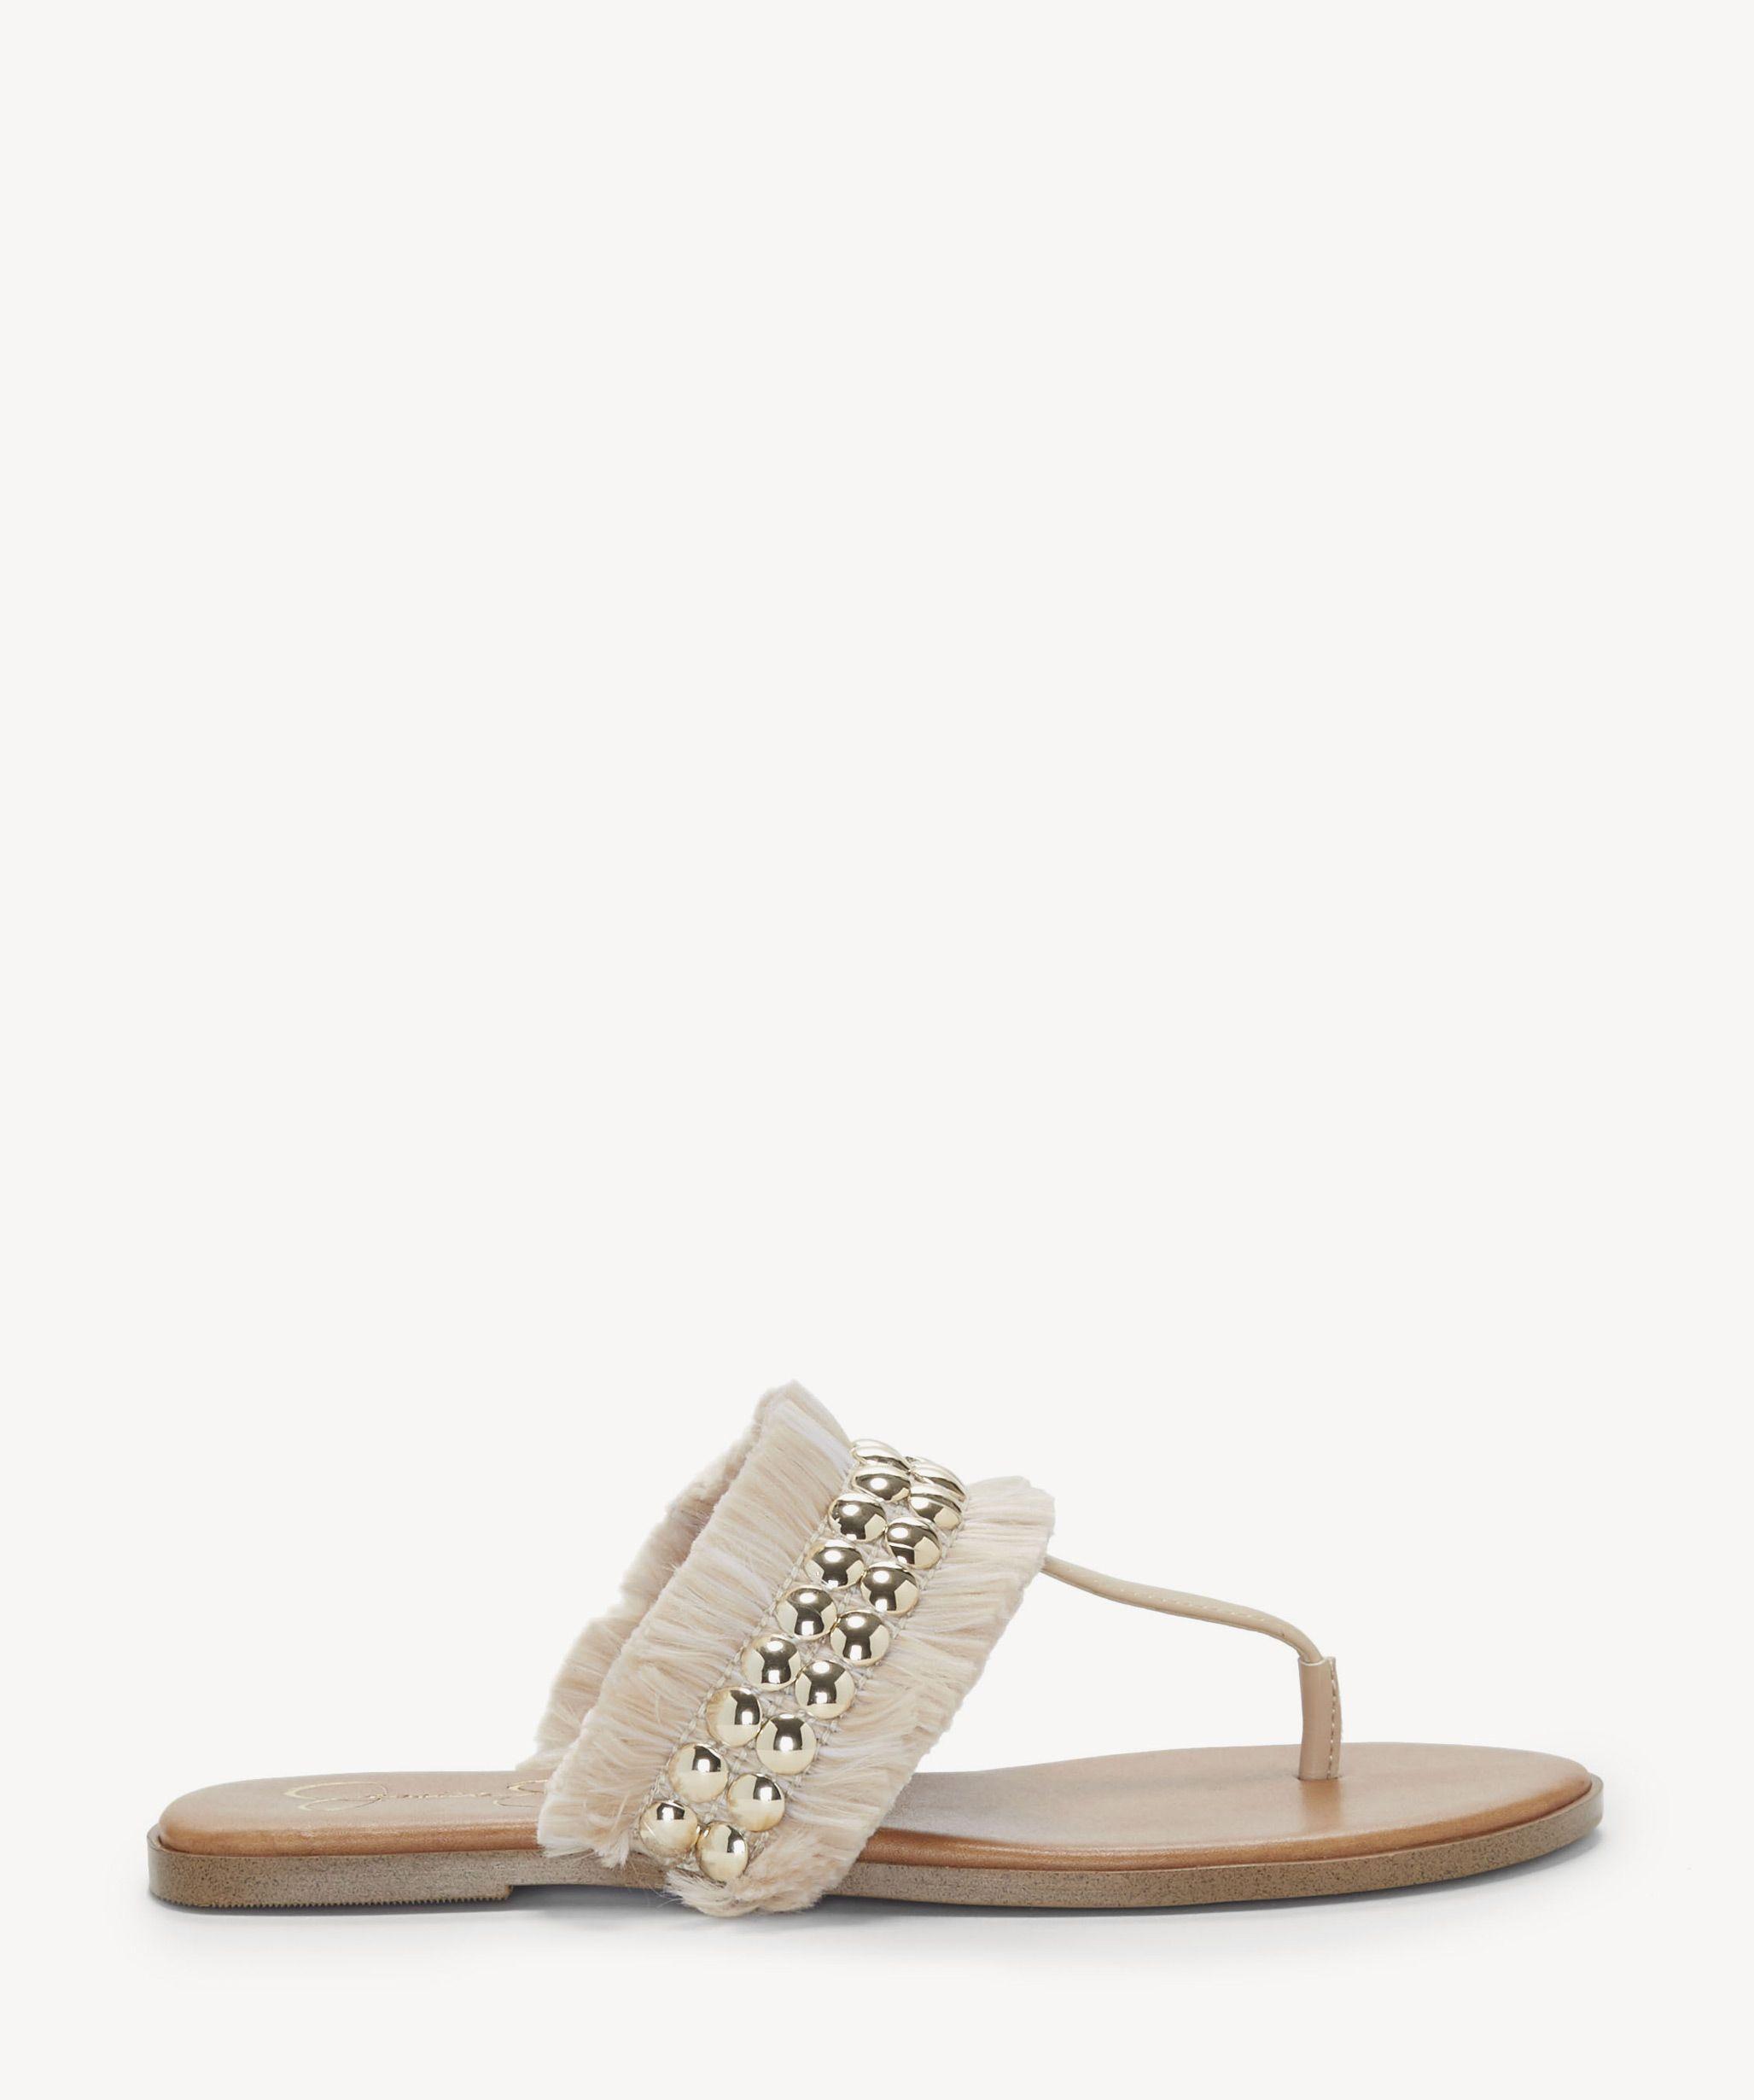 965b98856ce Jessica Simpson Crespo Fringe Flats Sandals Natural Sand Dune